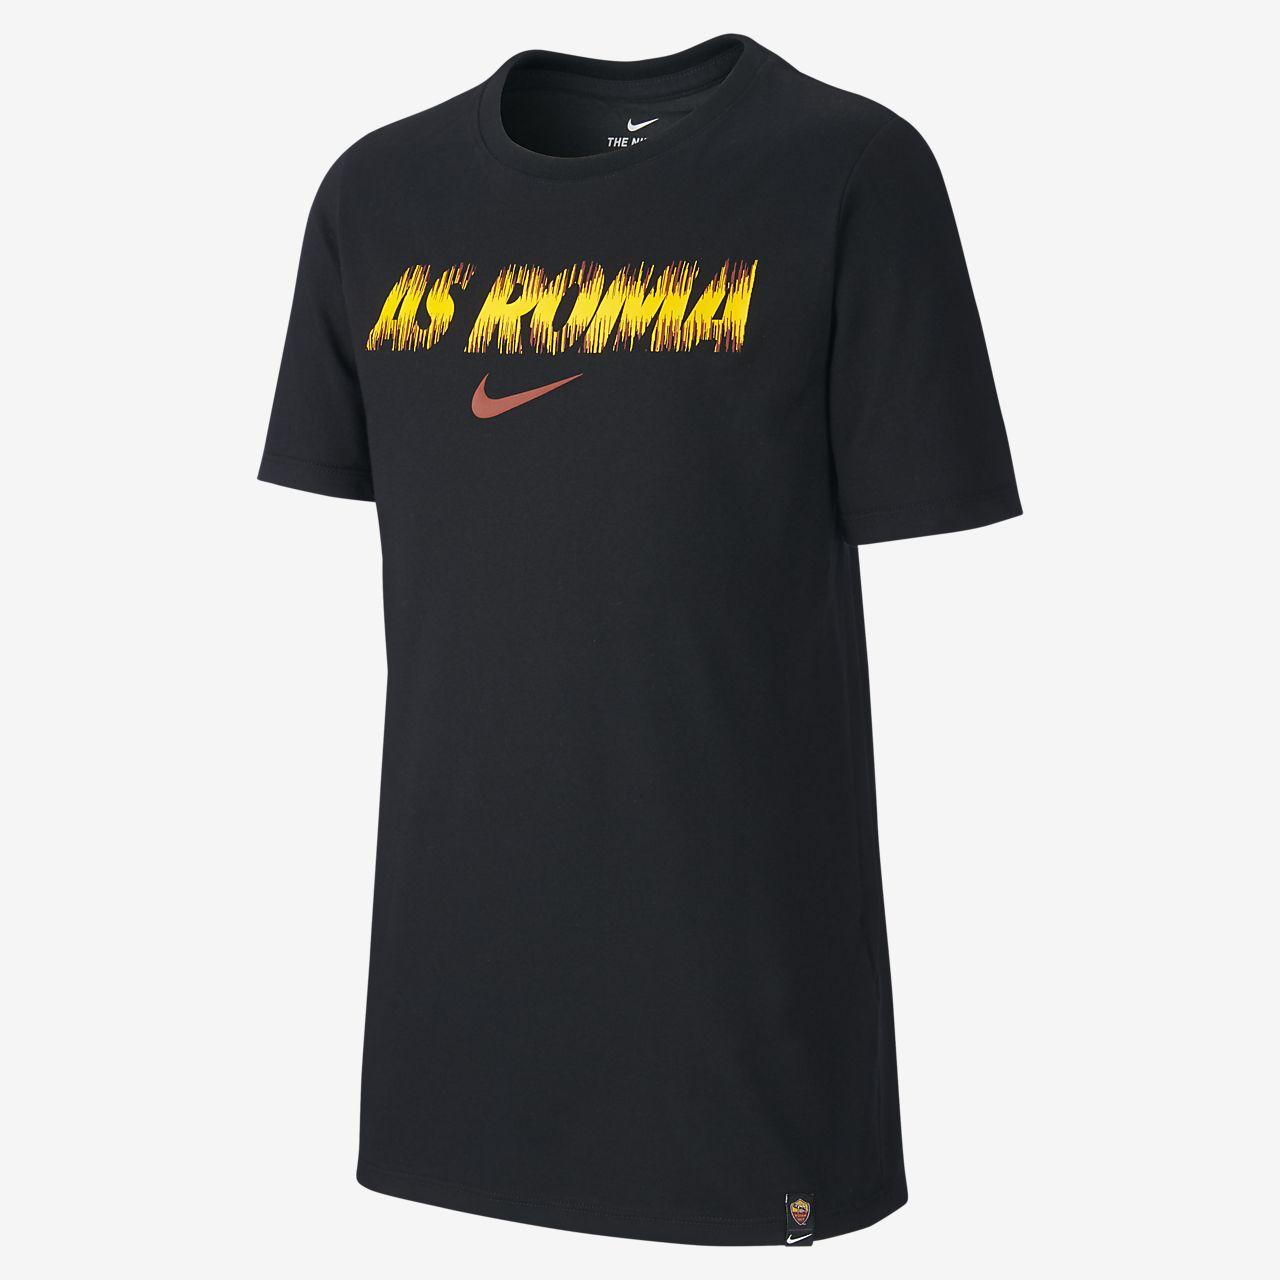 Nike Dri-FIT A.S. Roma Samarreta de futbol - Nen/a